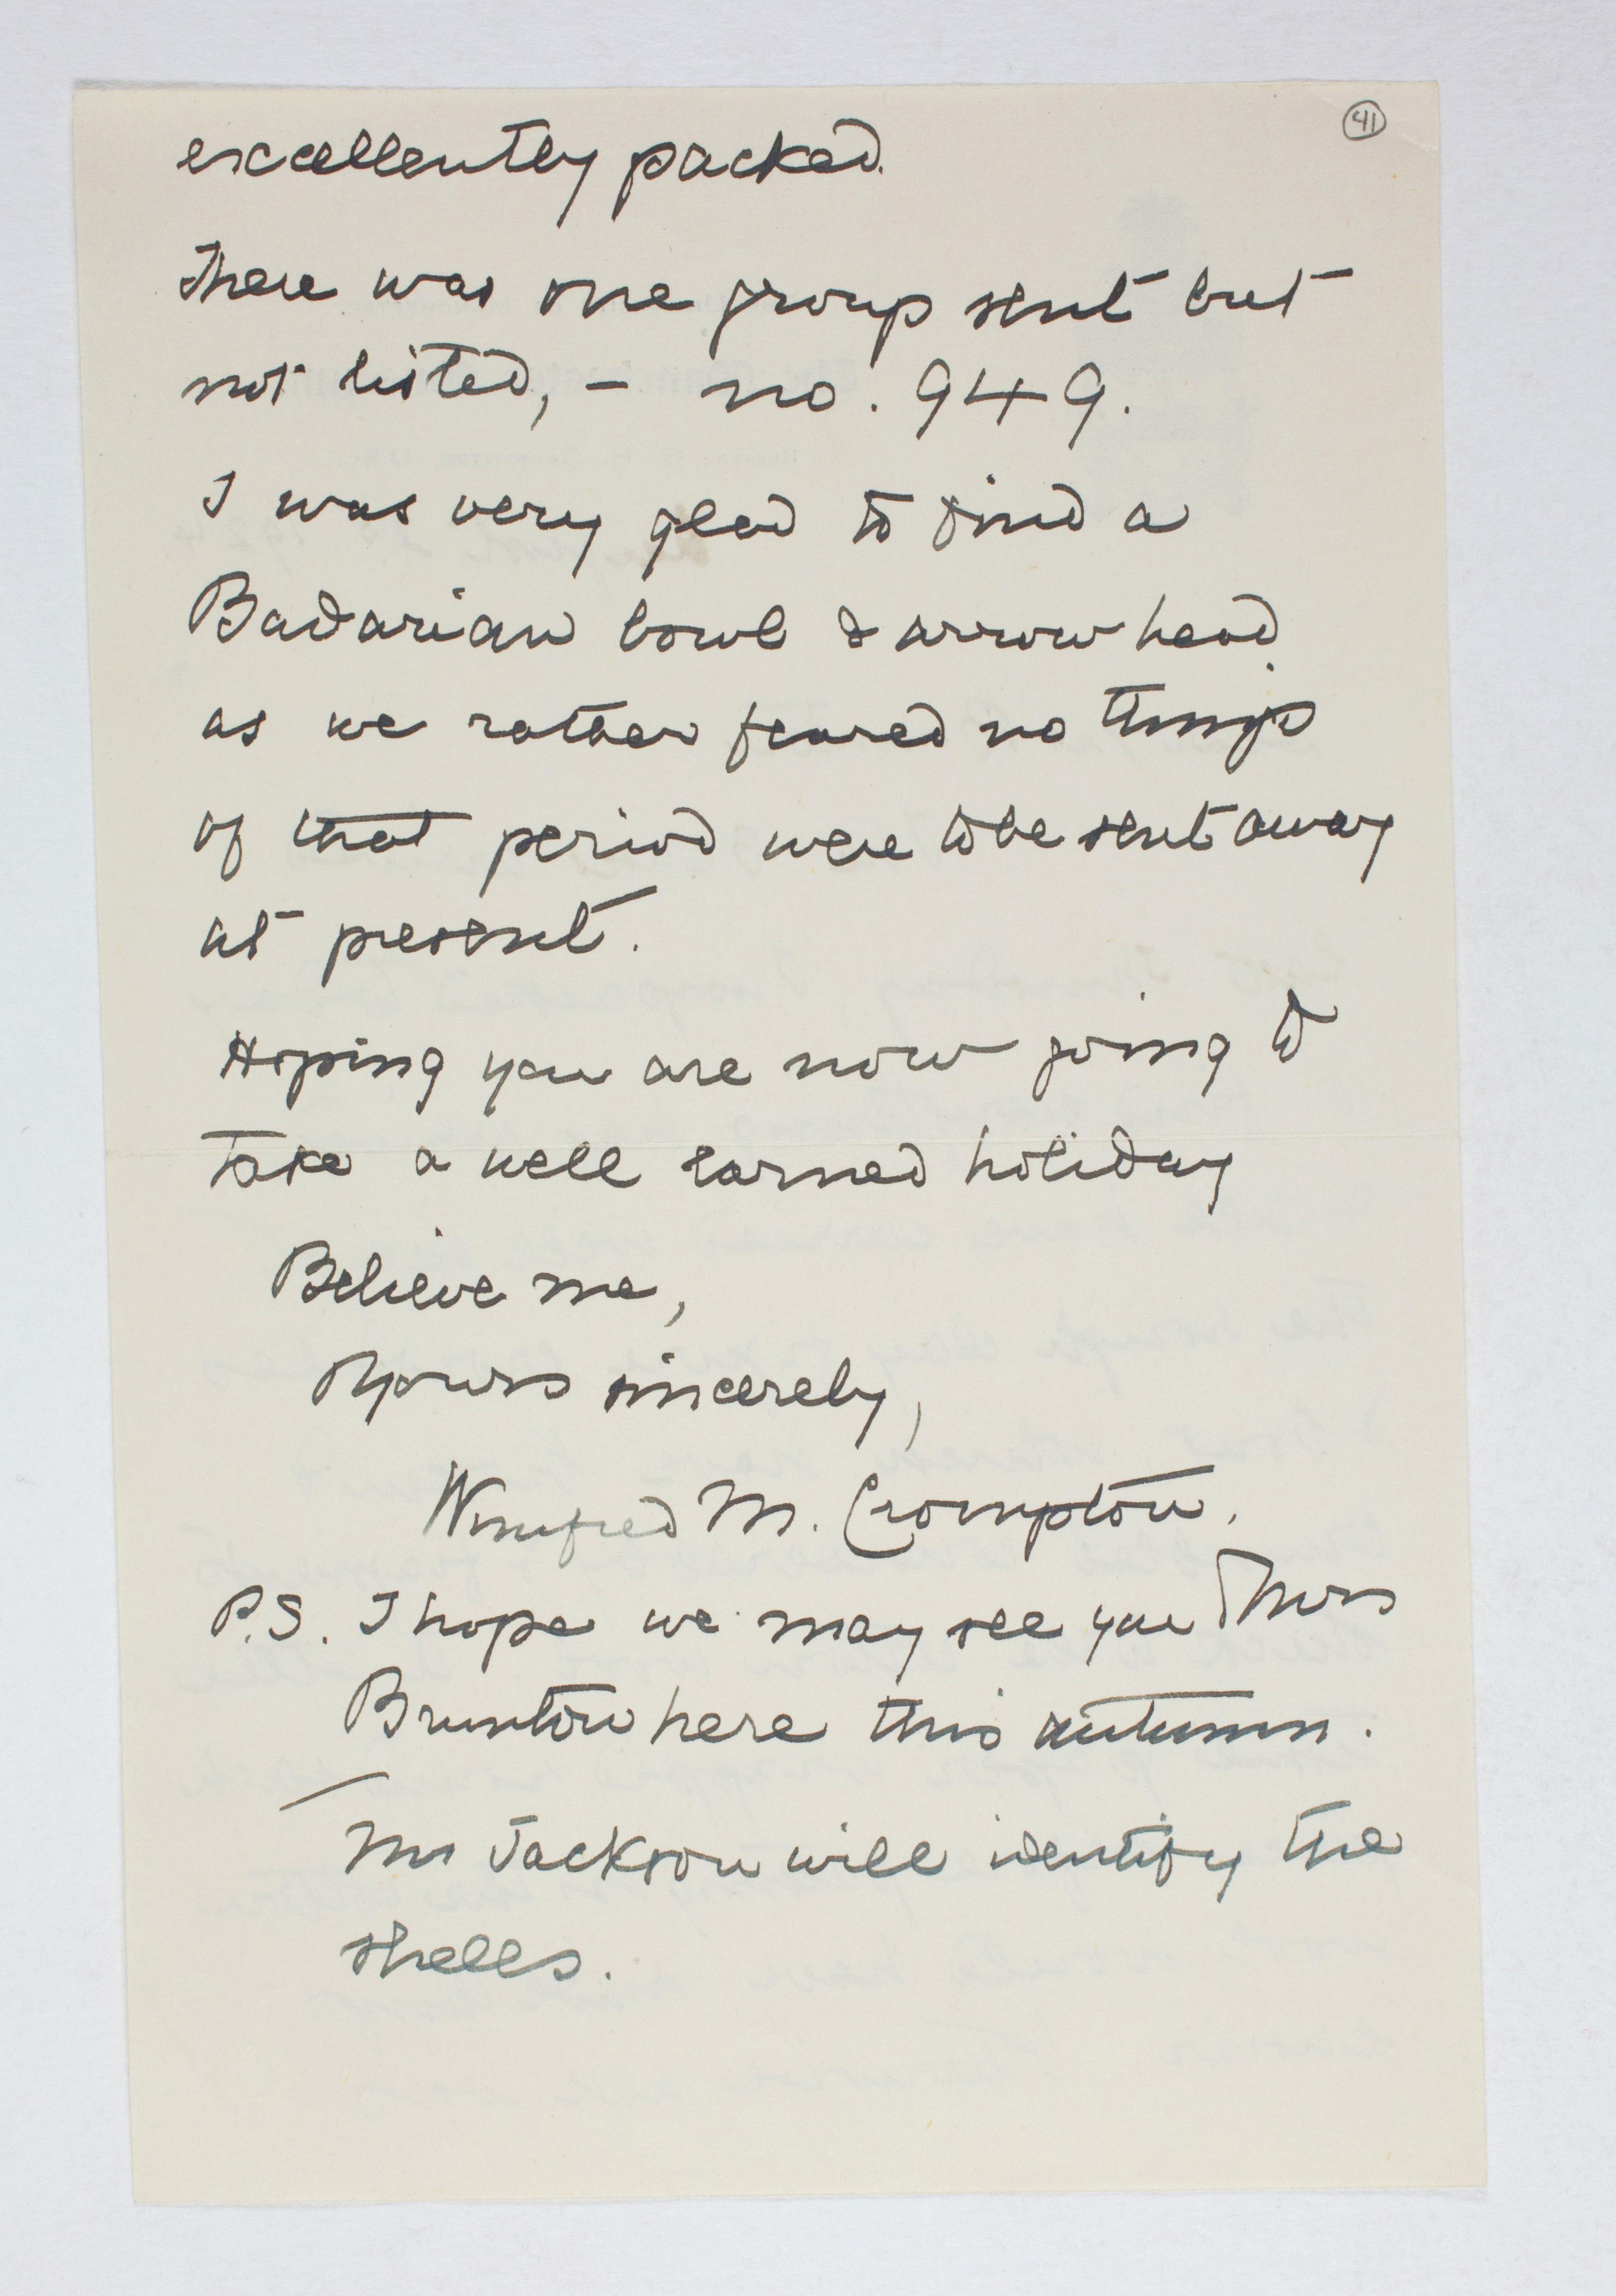 1923-24 Qau el-Kebir, Hemamieh Correspondence PMA/WFP1/D/27/41.2